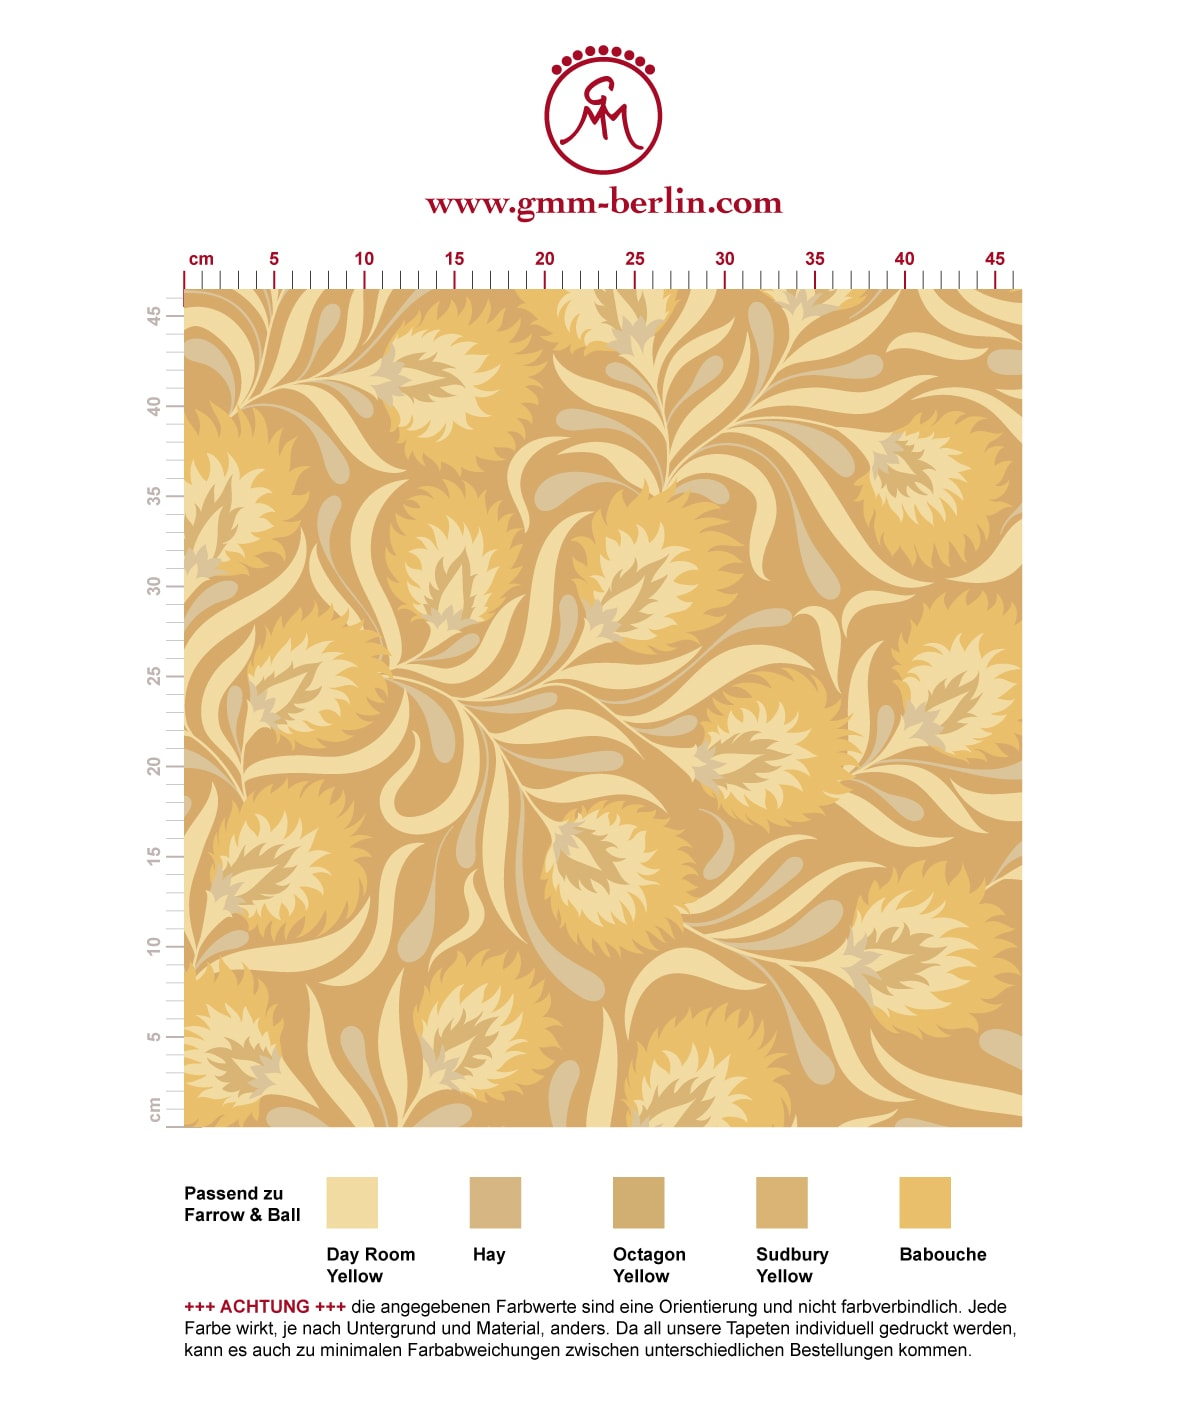 Jugendstil Tapete mit großen Blüten in gelb angepasst an Farrow & Ball Wandfarben. Aus dem GMM-BERLIN.com Sortiment: Schöne Tapeten in creme Farbe